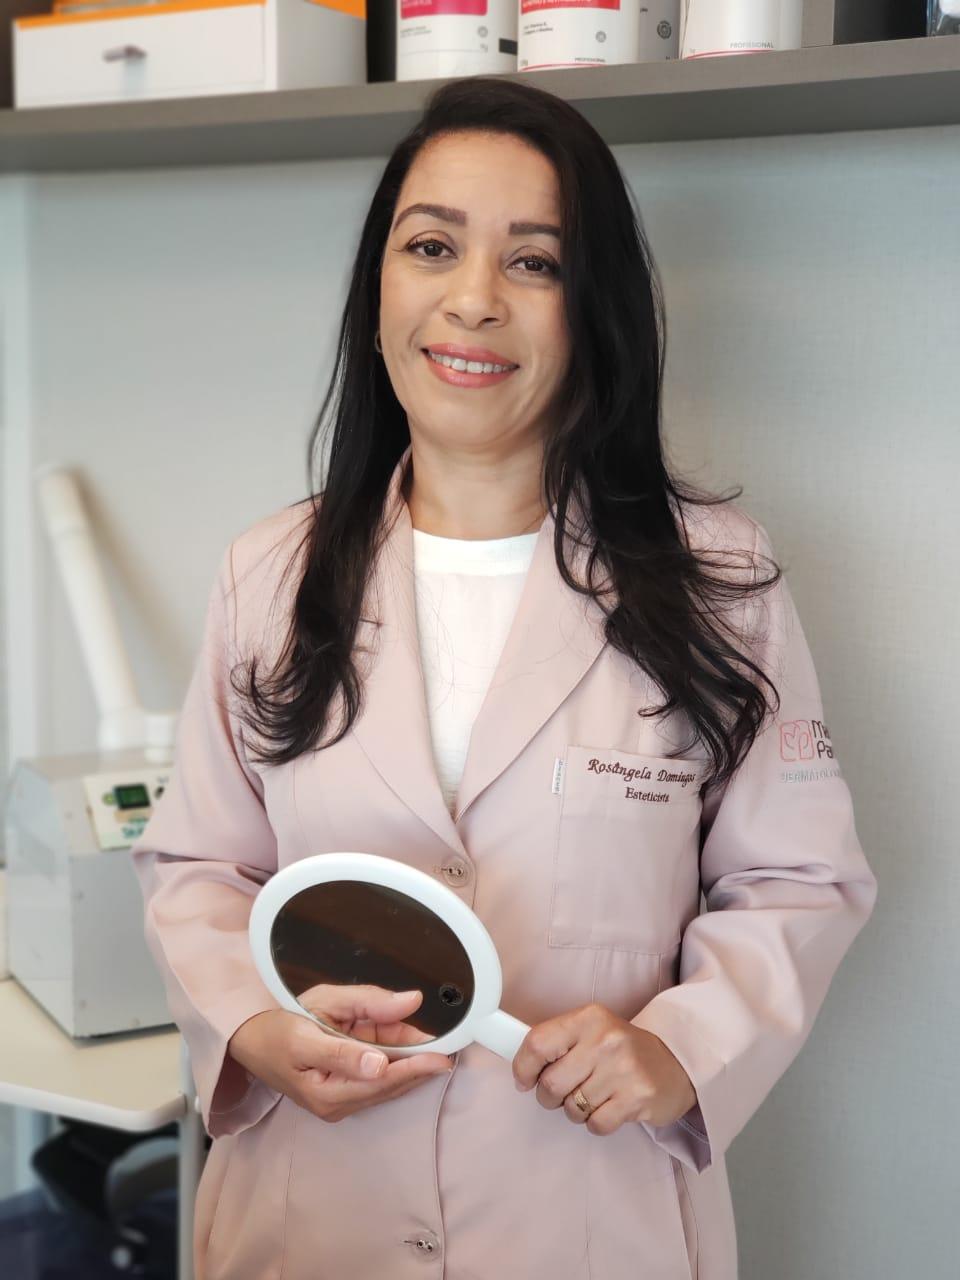 Rosângela Domingos